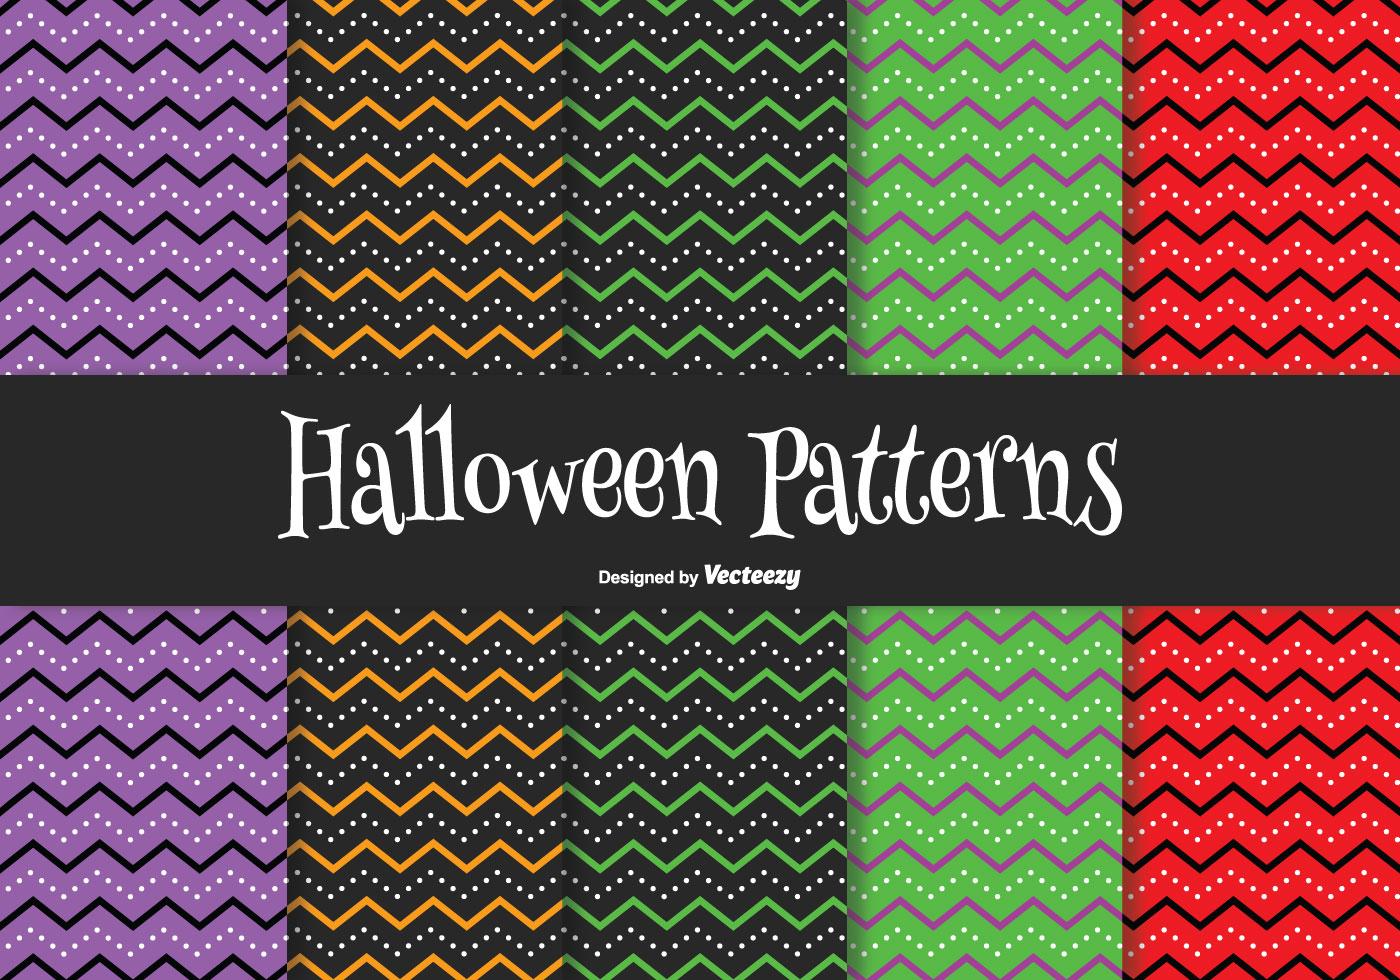 Spooky Fall Wallpaper Halloween Pattern Set Download Free Vector Art Stock